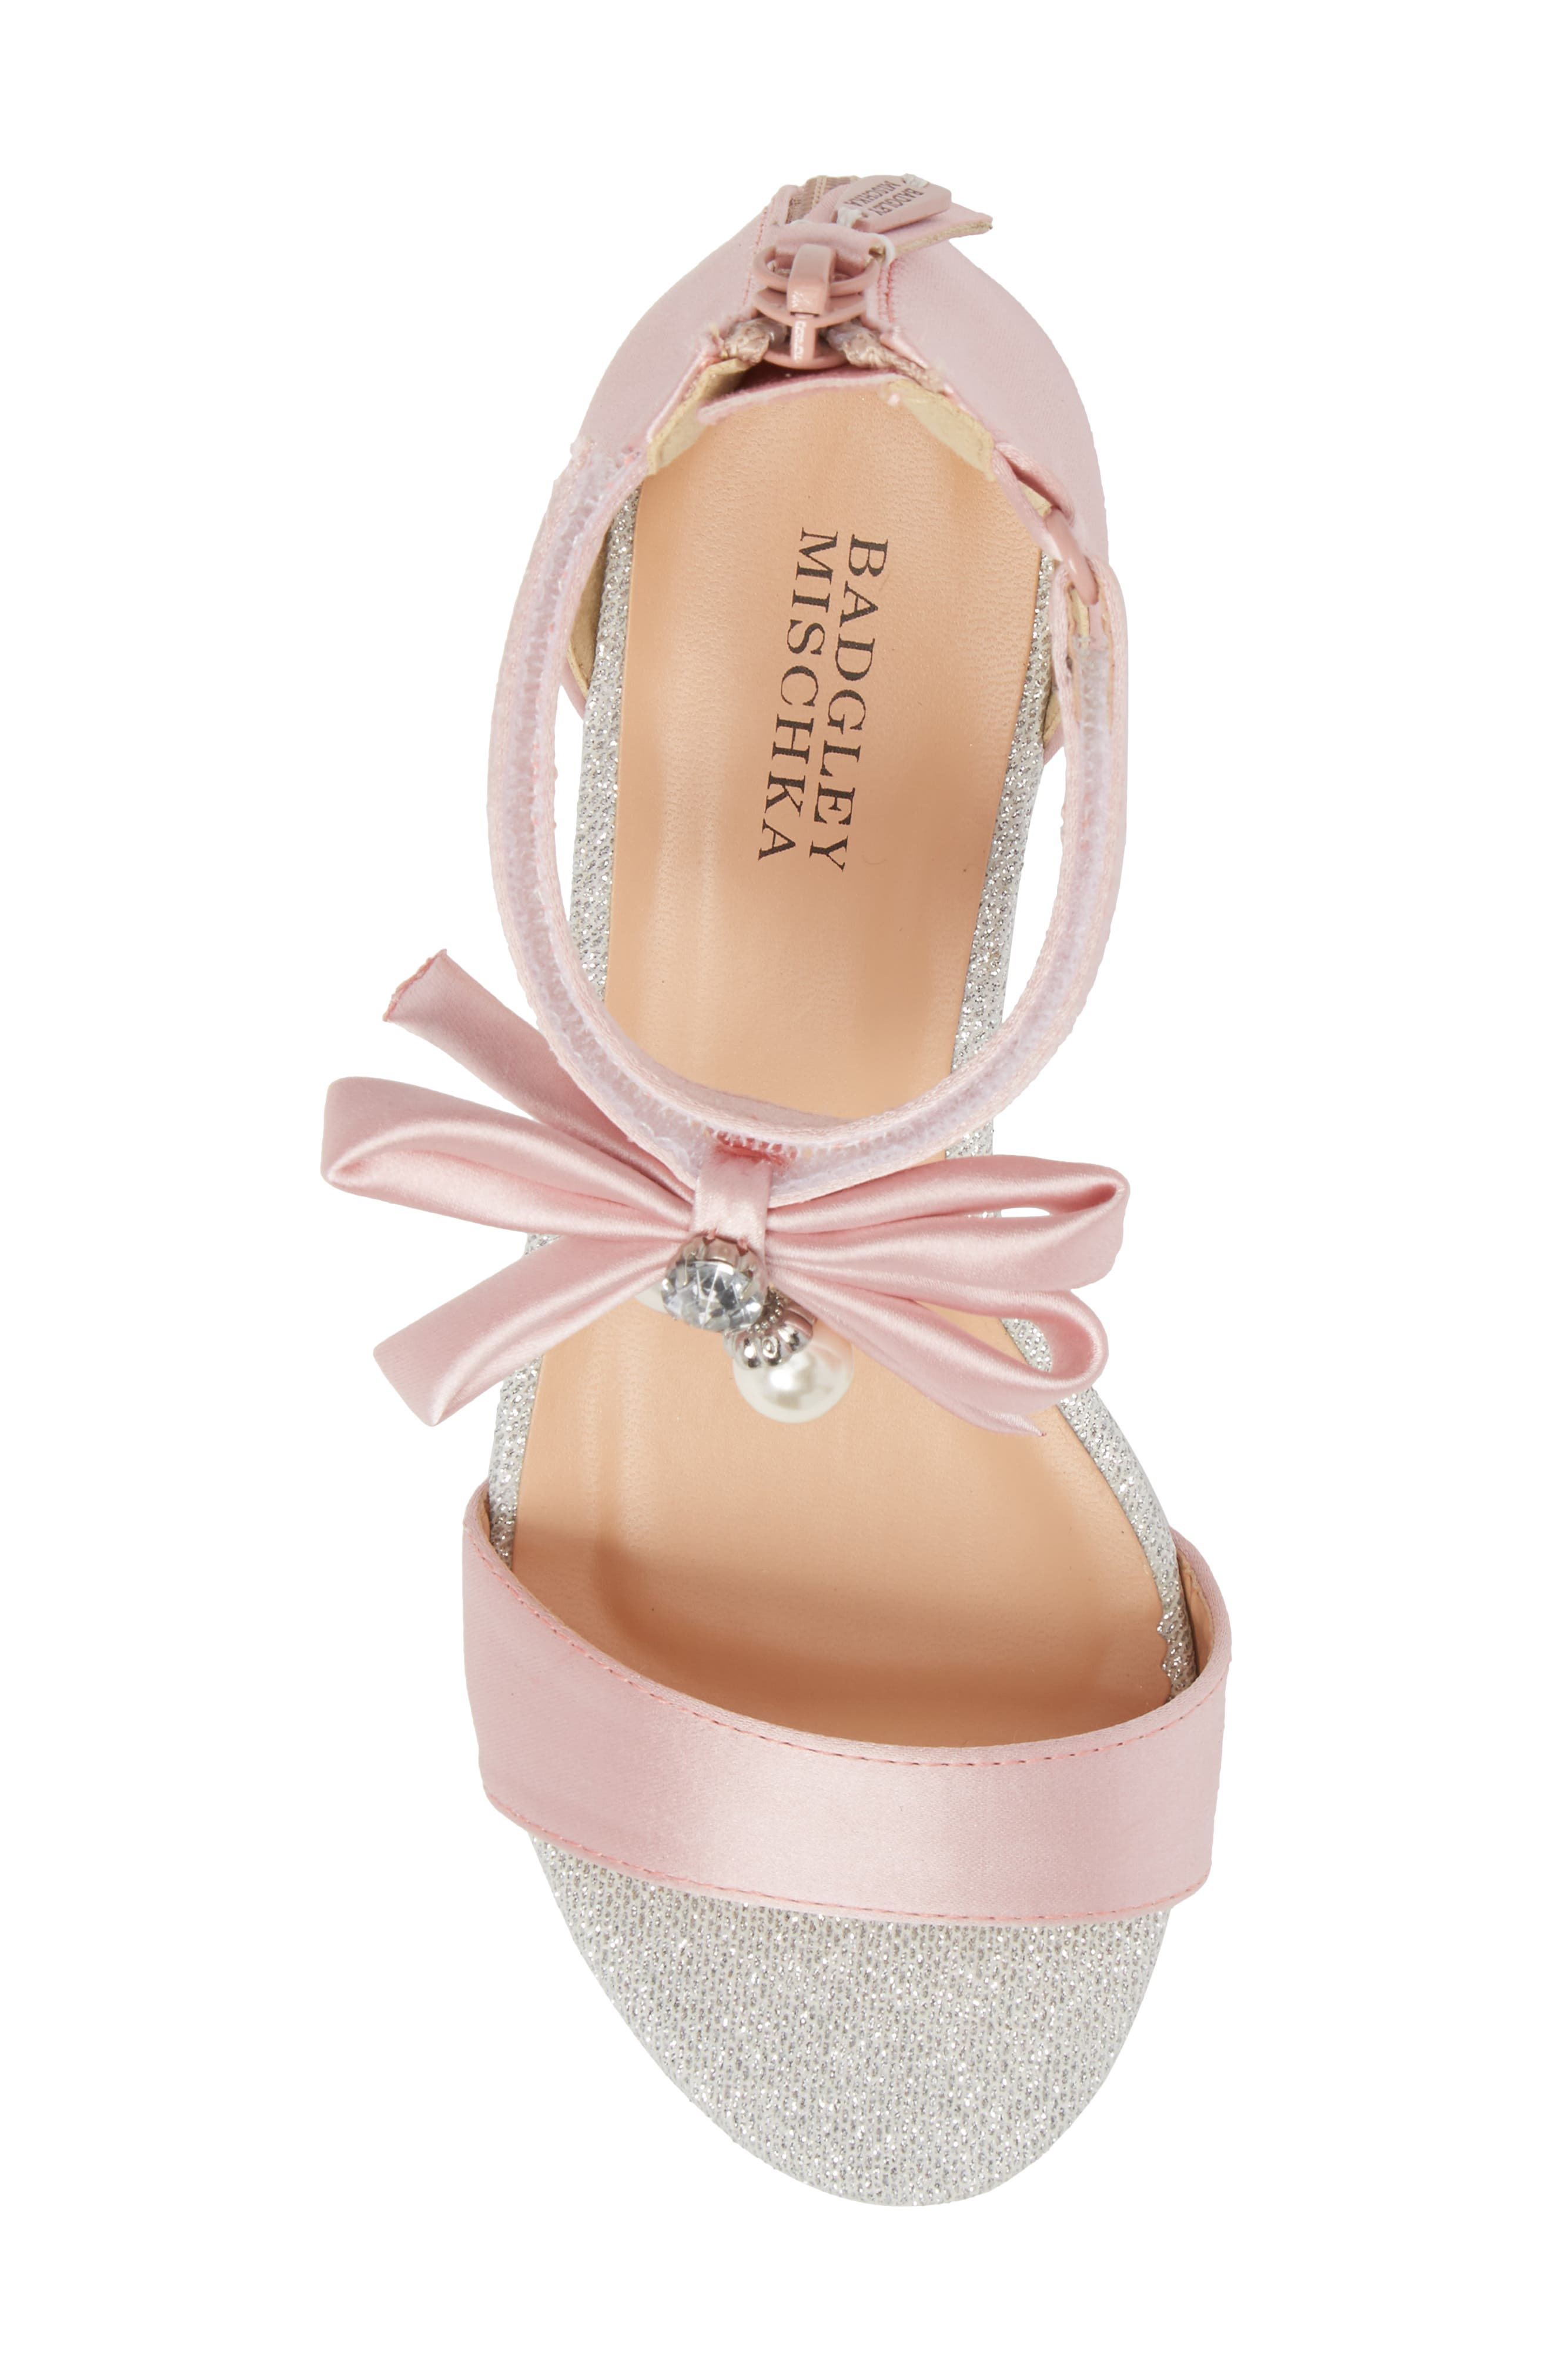 BADGLEY MISCHKA COLLECTION, Badgley Mischka Pernia Embellished Sandal, Alternate thumbnail 5, color, PINK/ SILVER